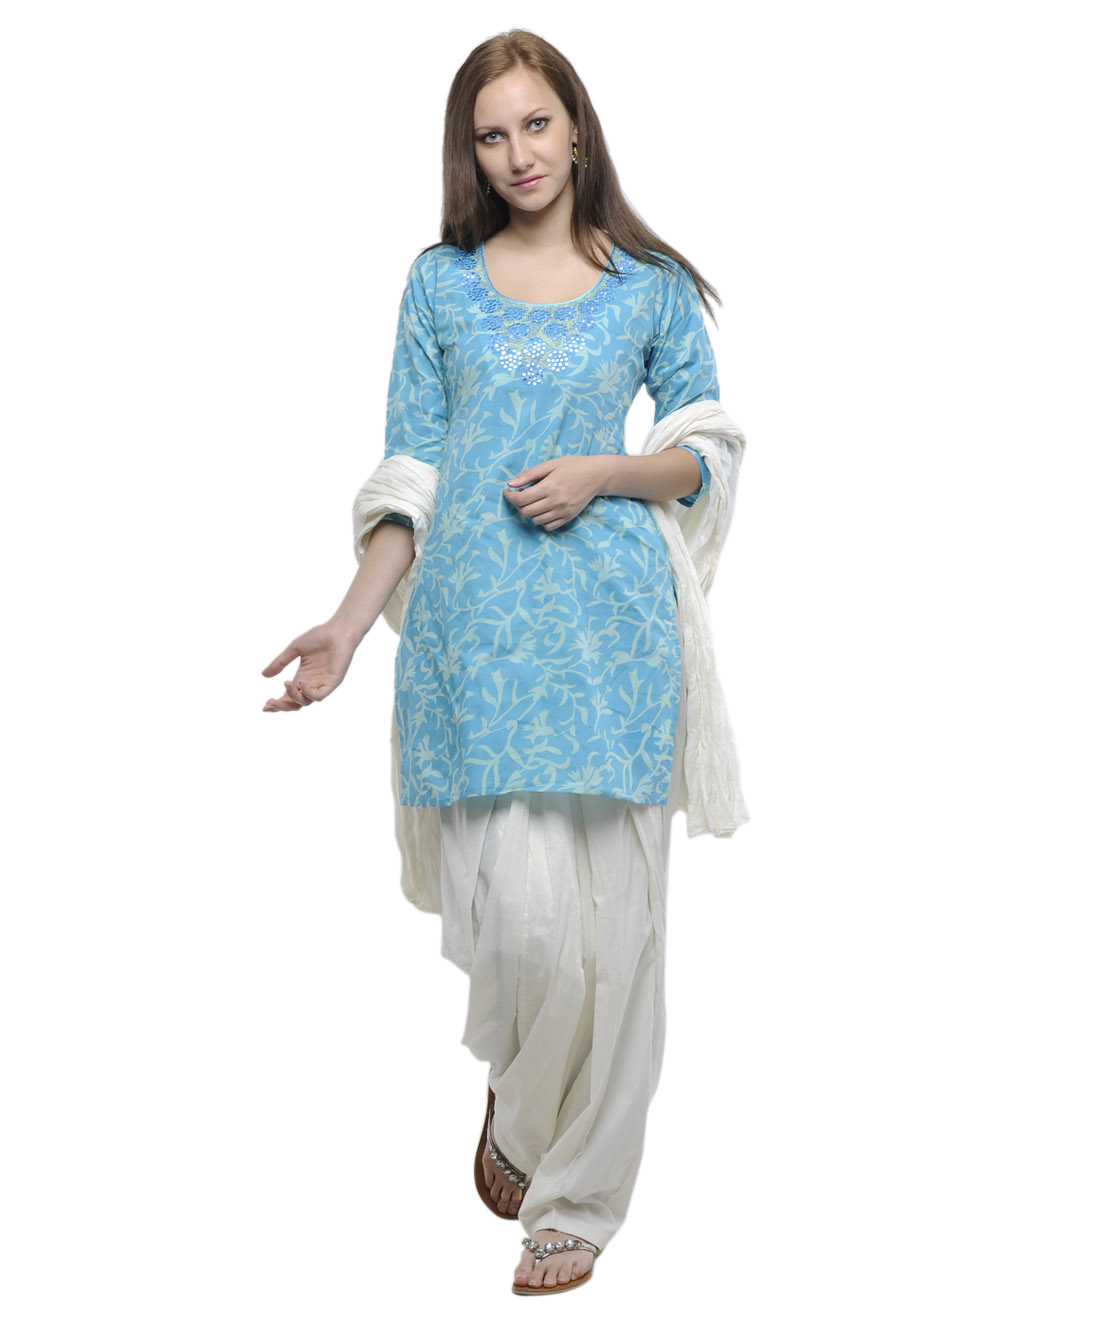 Clothing9 latest clothes fashion online pakistani dress designers